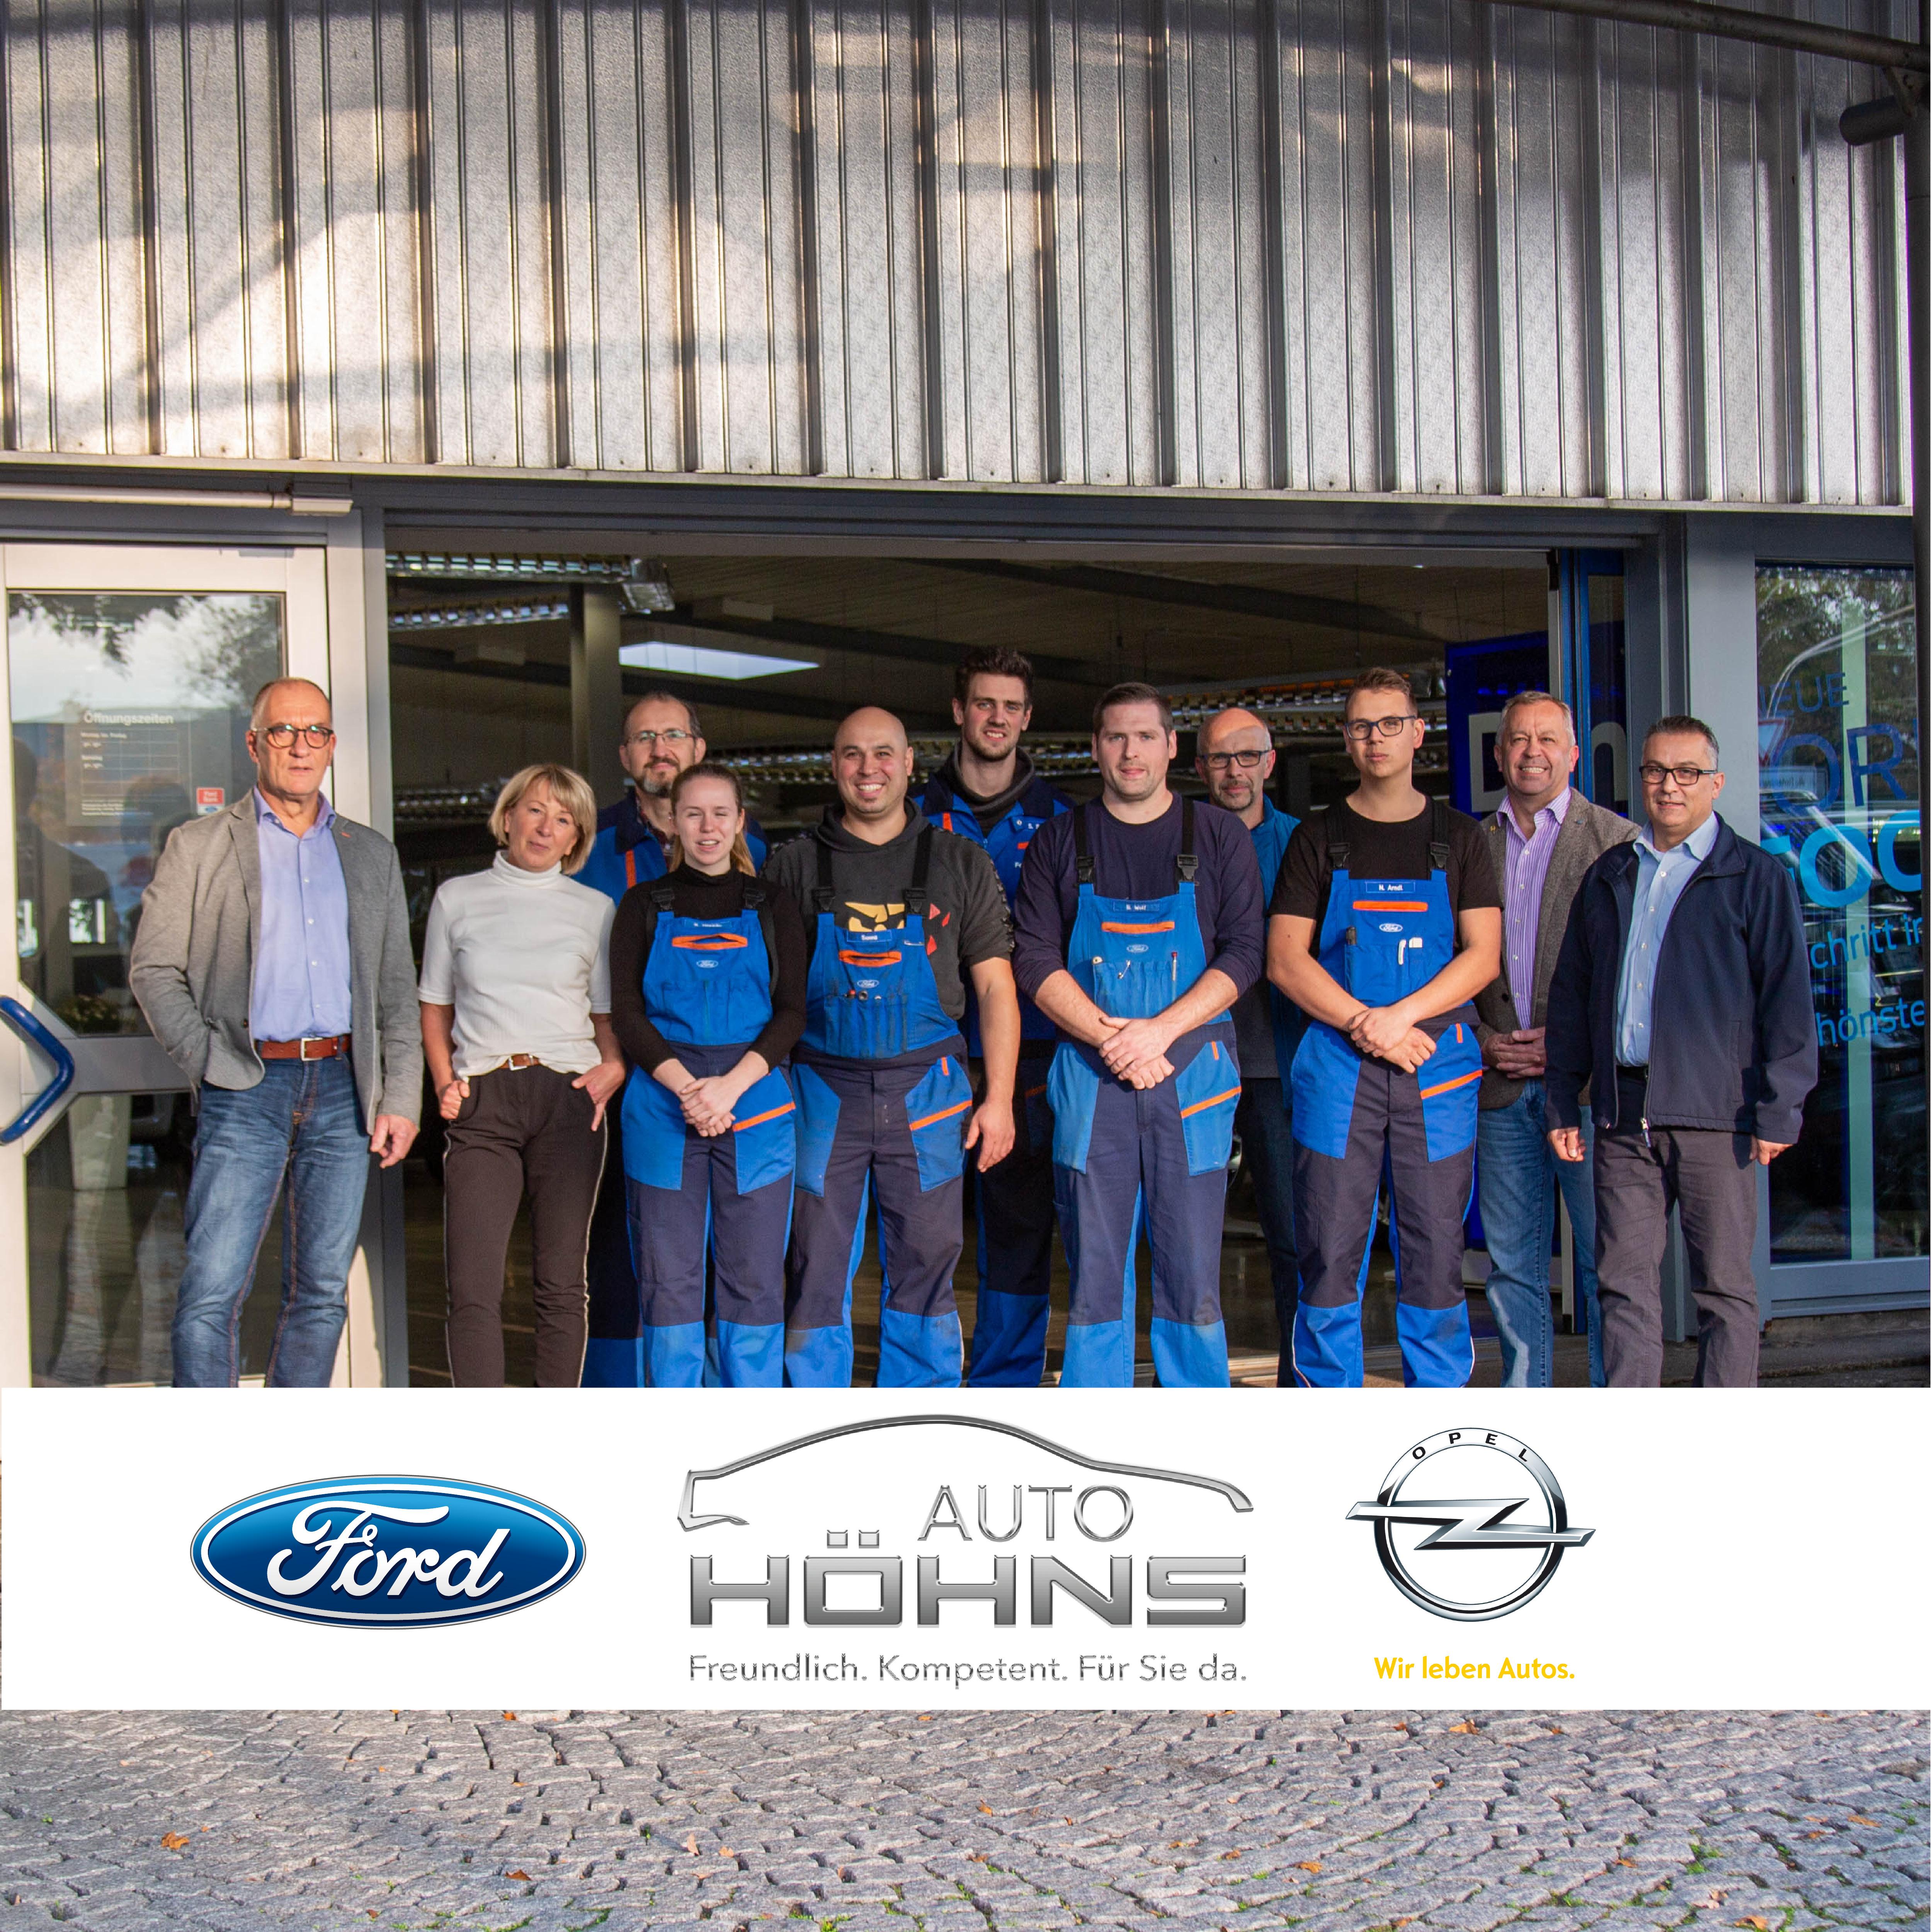 Auto-Höhns GmbH & Co. KG